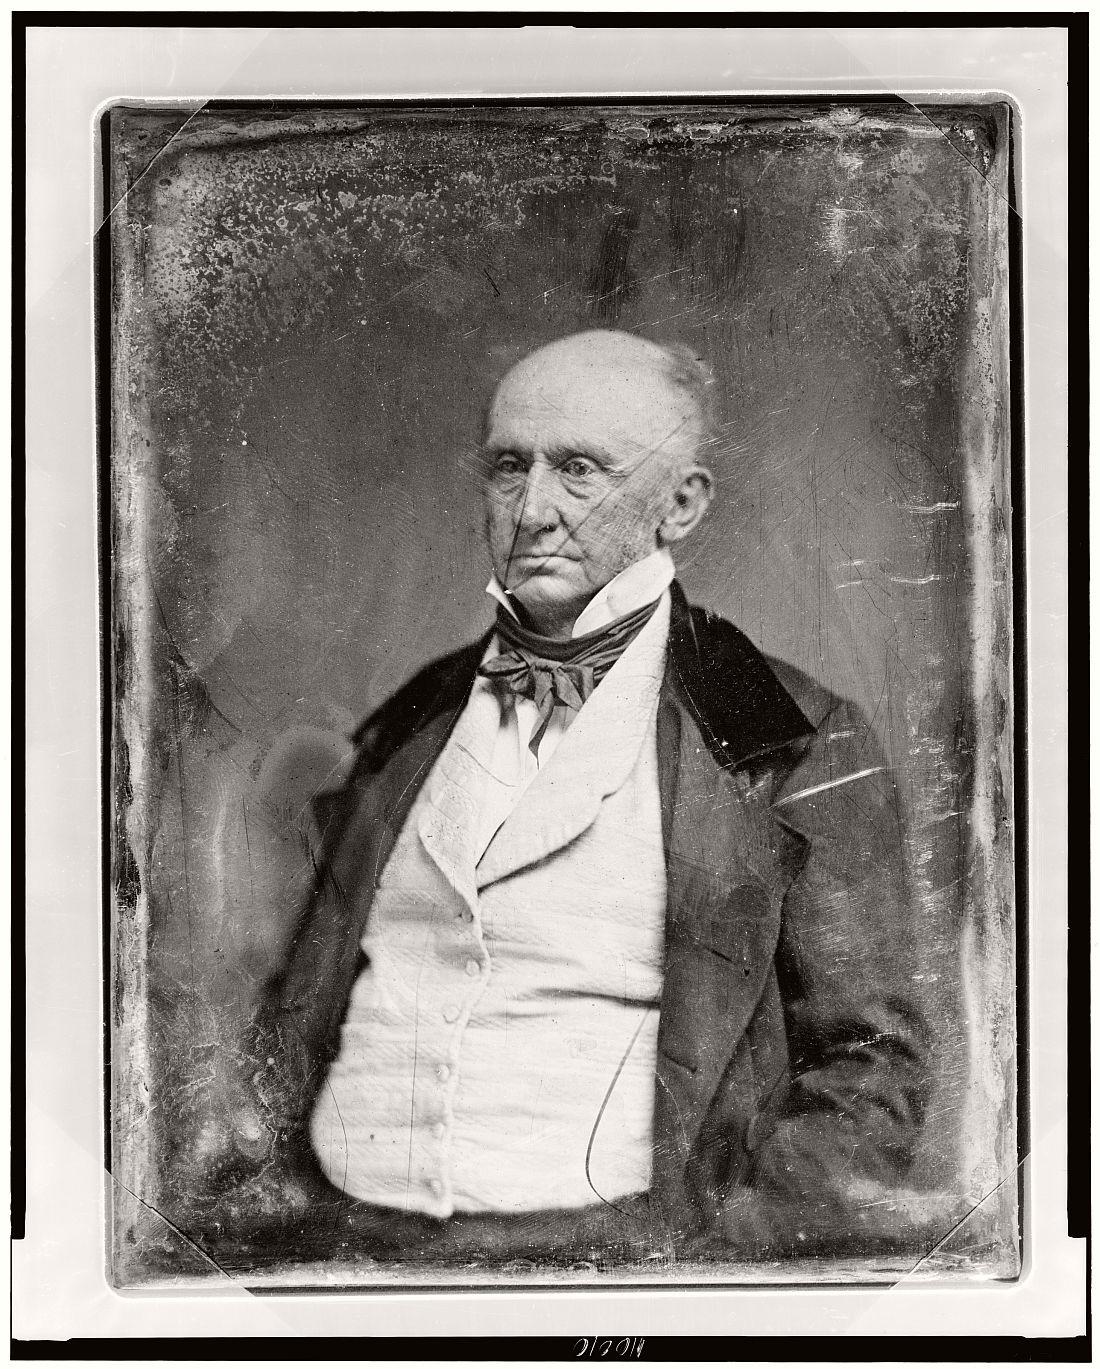 vintage-daguerreotype-portraits-from-xix-century-1844-1860-46